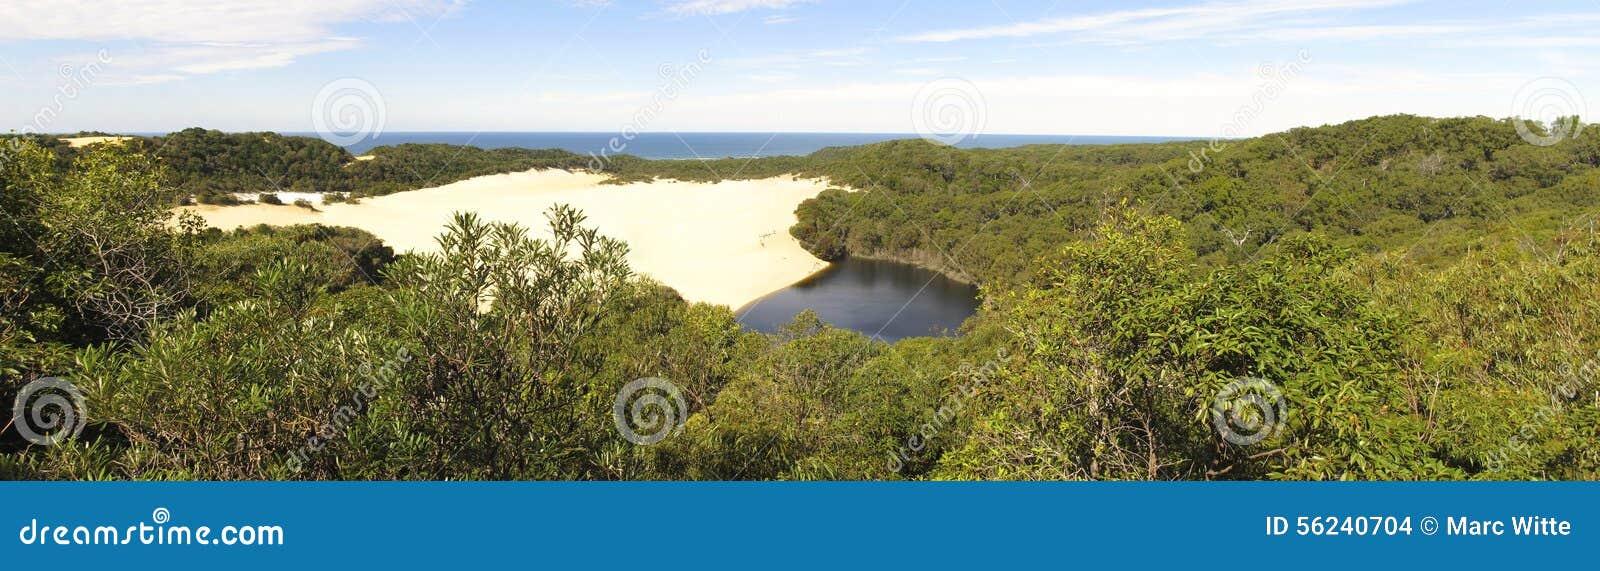 Sjö Wabby, Fraser Island, Queensland, Australien